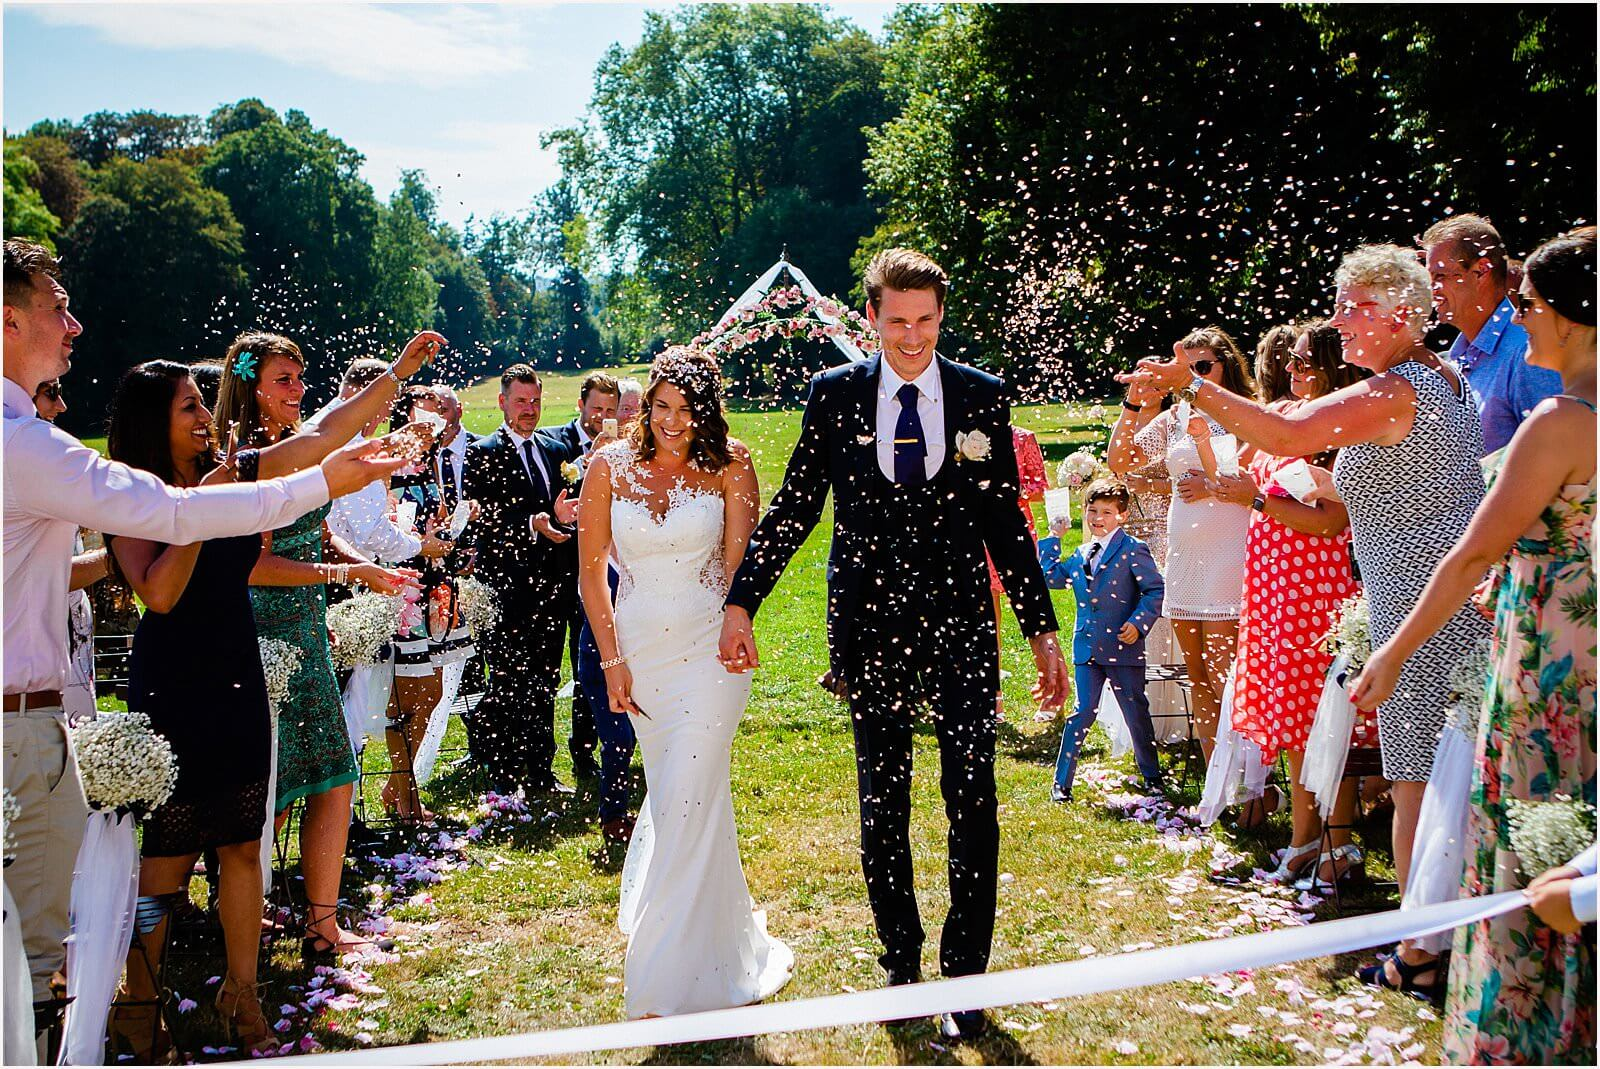 Chateau de Courtomer Wedding | Chantel & Evan 30